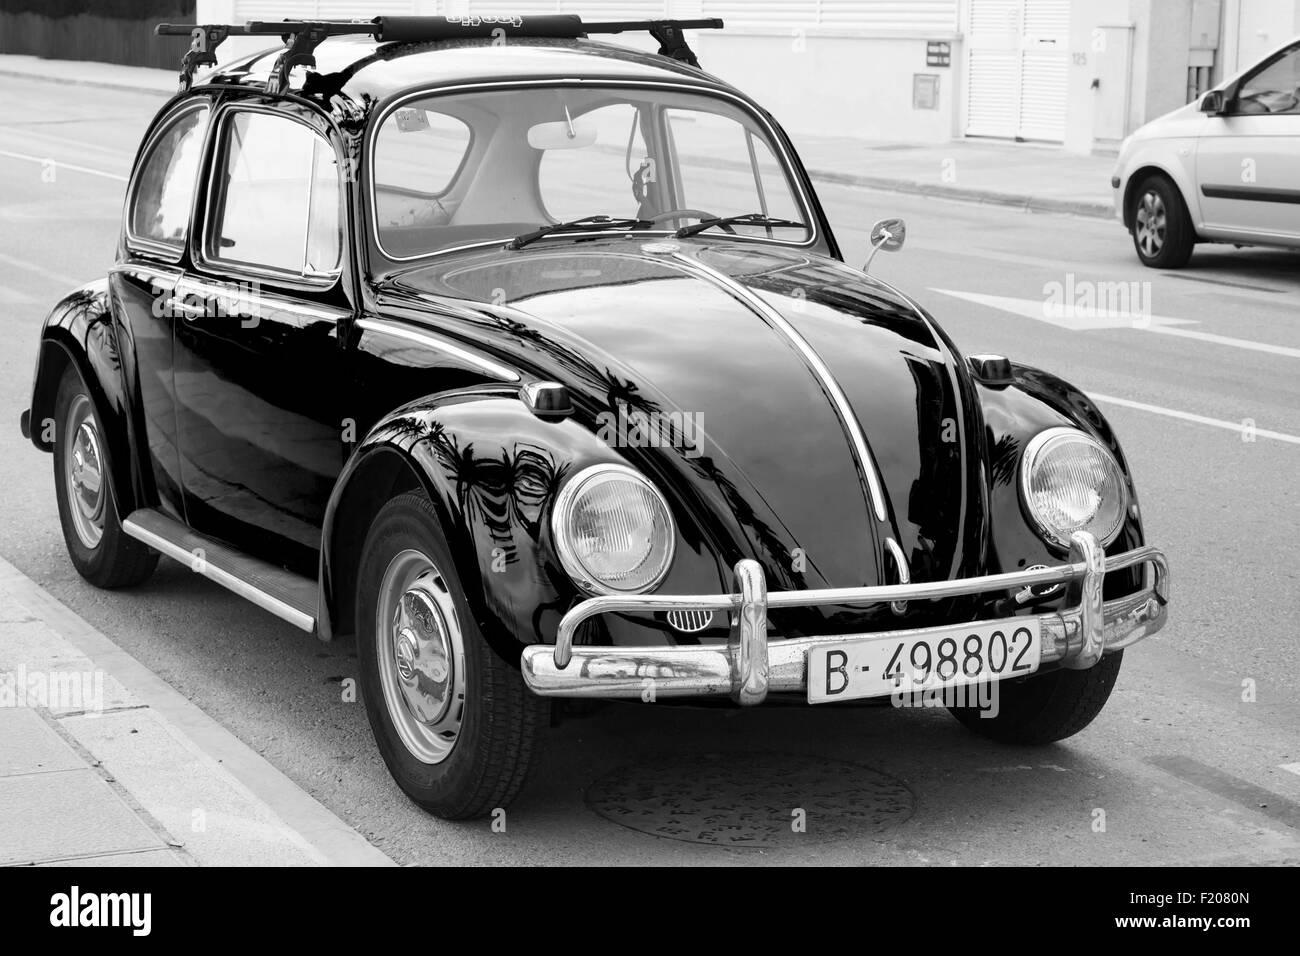 Calafel, Spain - August 20, 2014: Volkswagen Kafer stands parked on the roadside - Stock Image